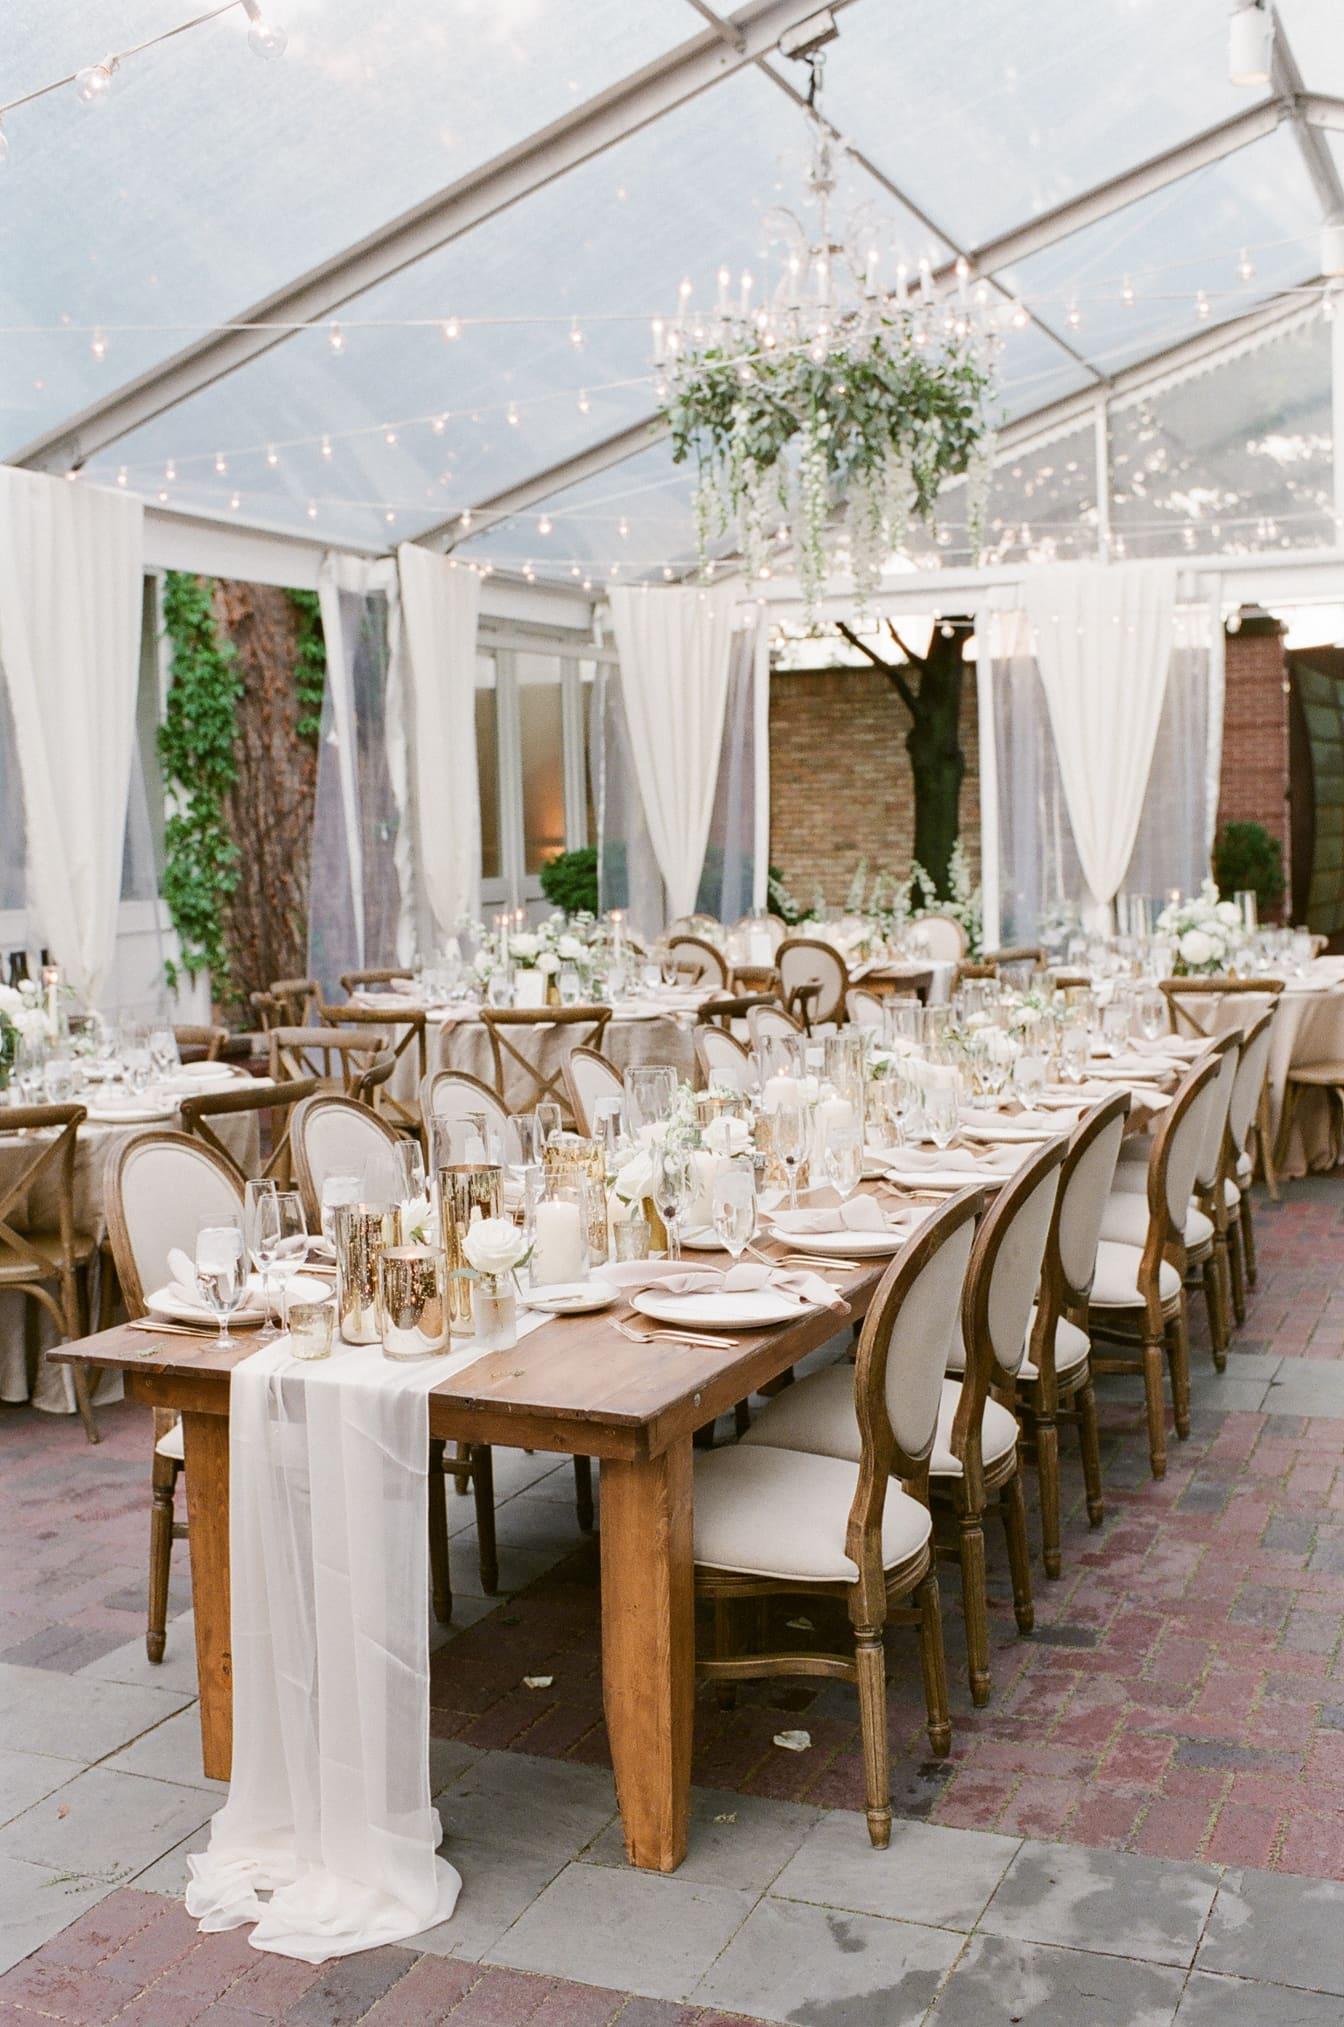 Tent wedding at Chicago Illuminating Company